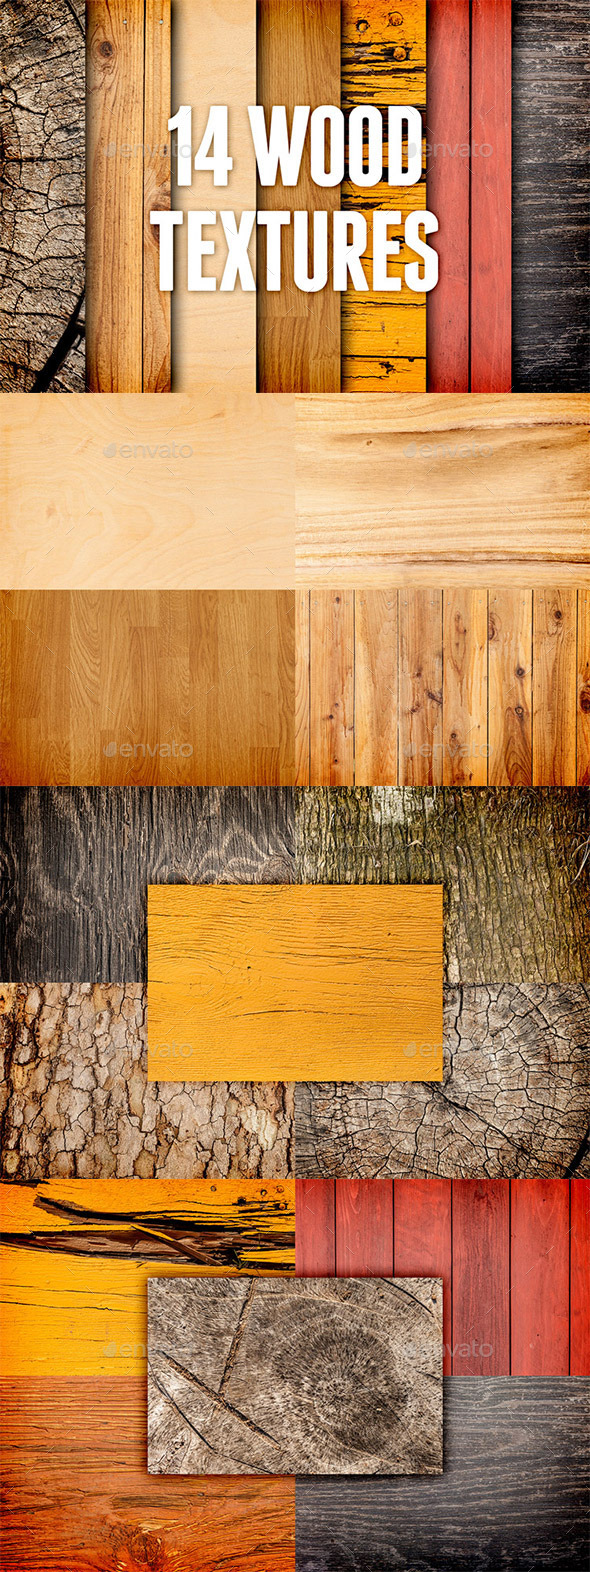 Wood Textures Pack 3 - Wood Textures